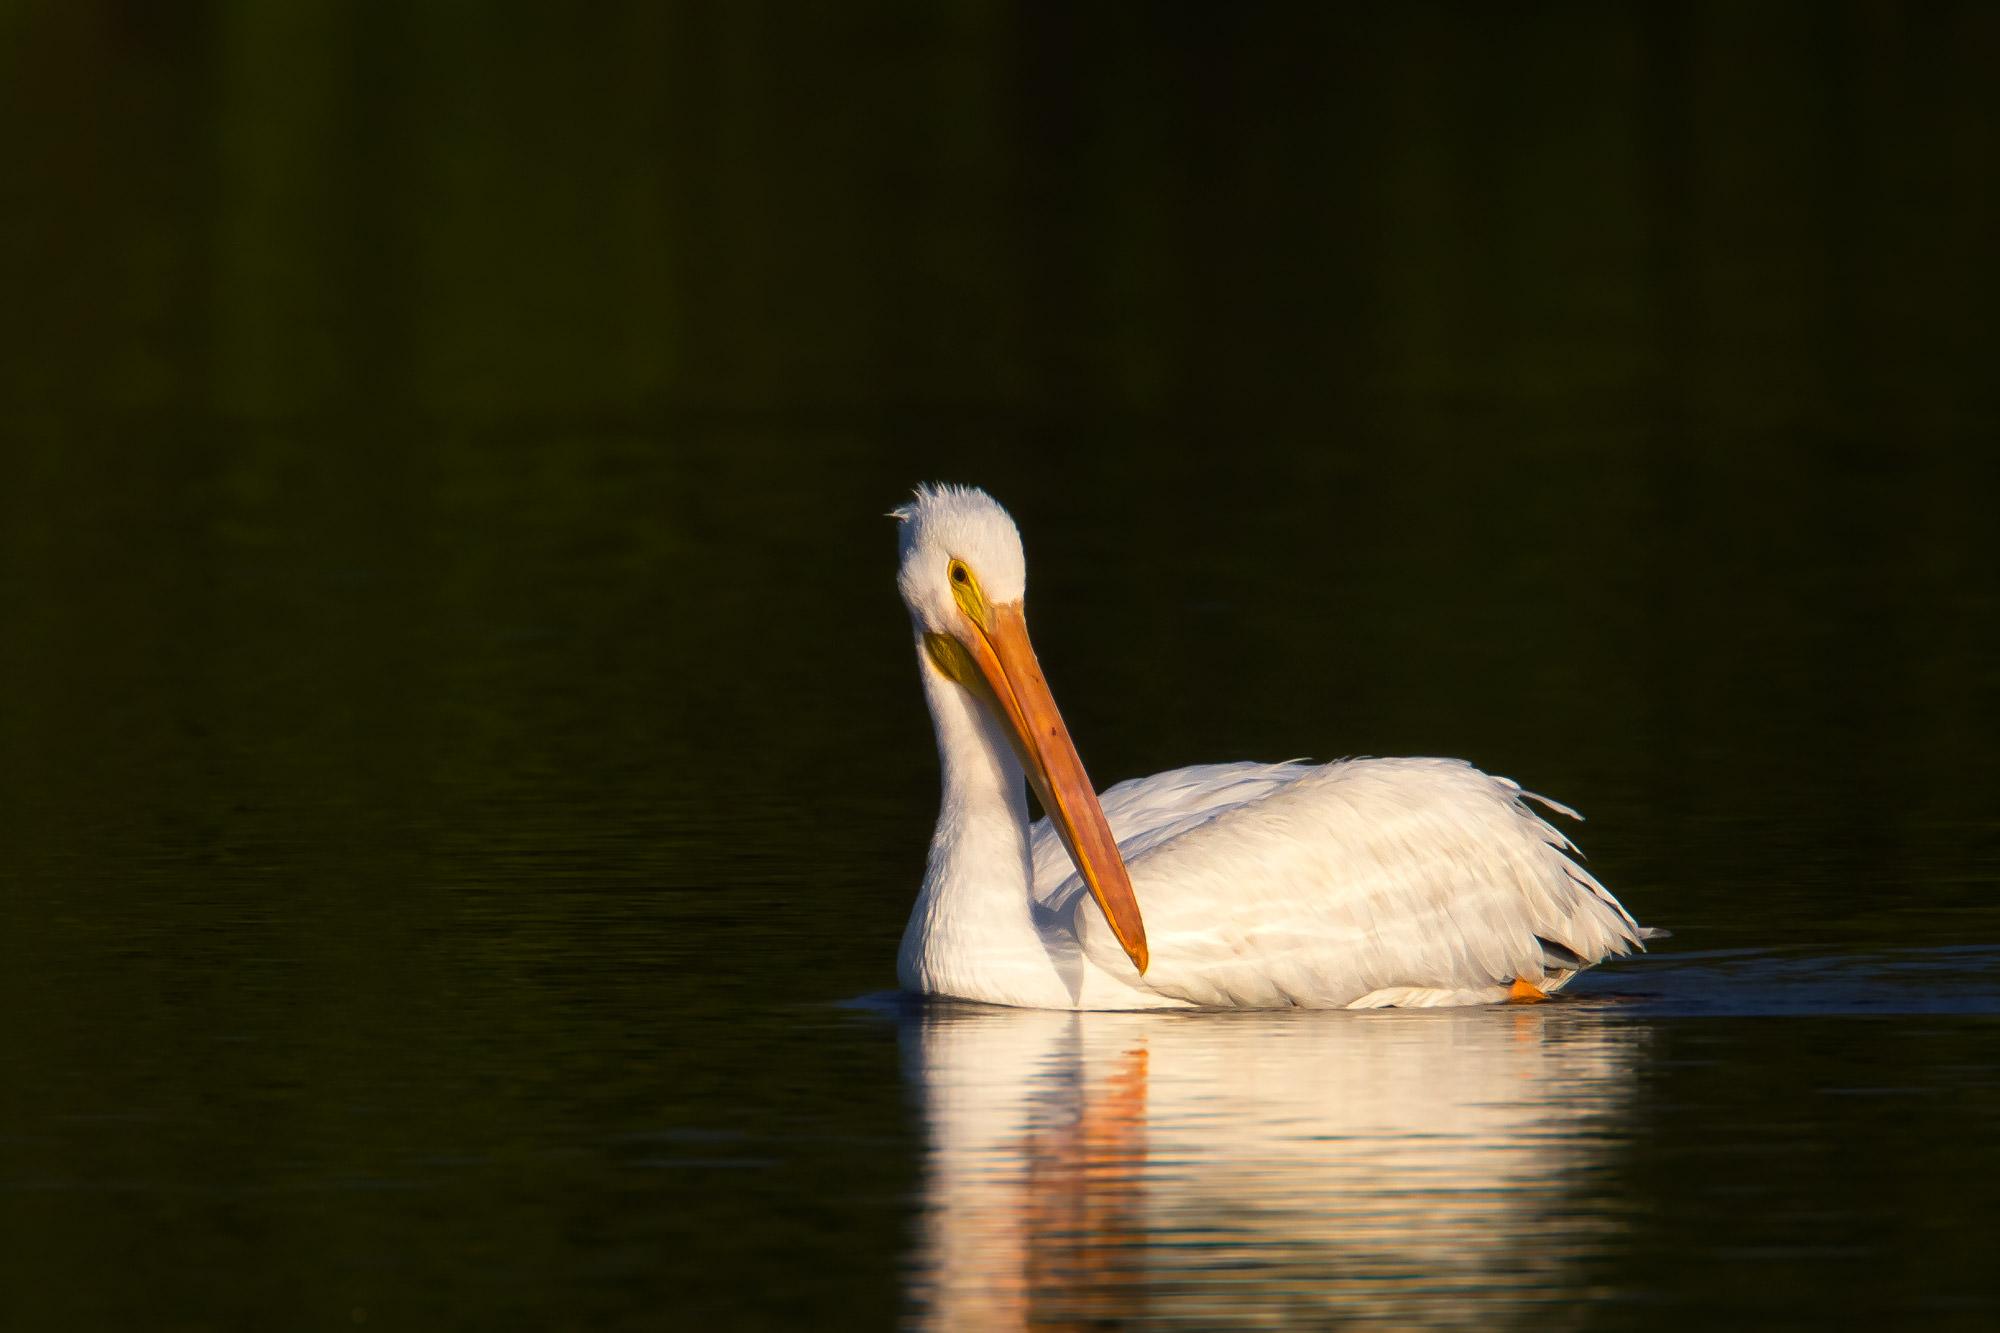 Pelican, White Pelican, Florida, limited edition, photograph, photo